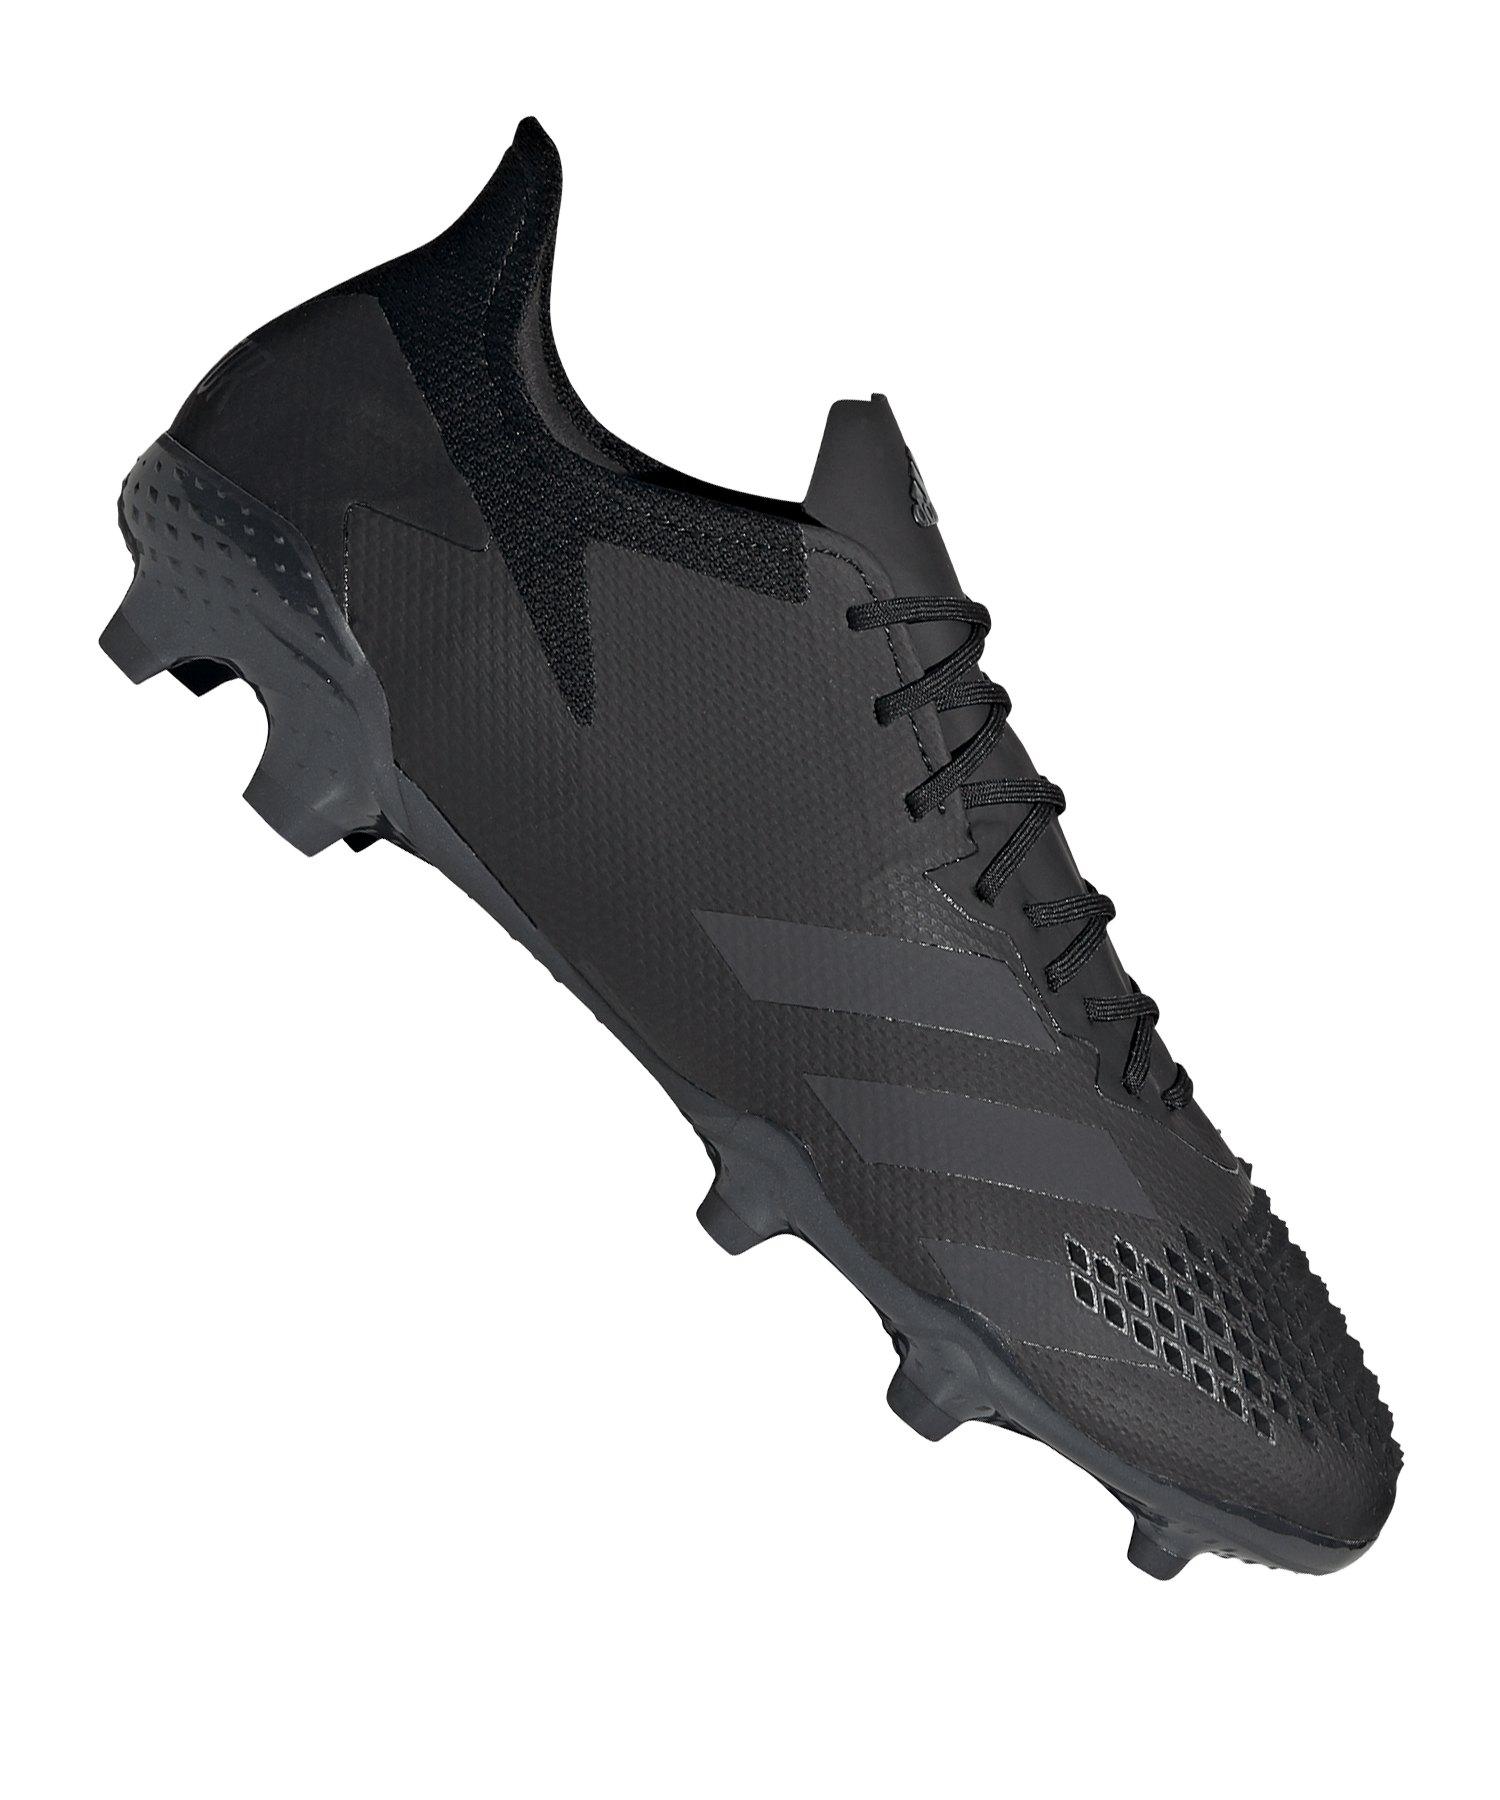 adidas Predator 20.2 FG Schwarz Grau - schwarz